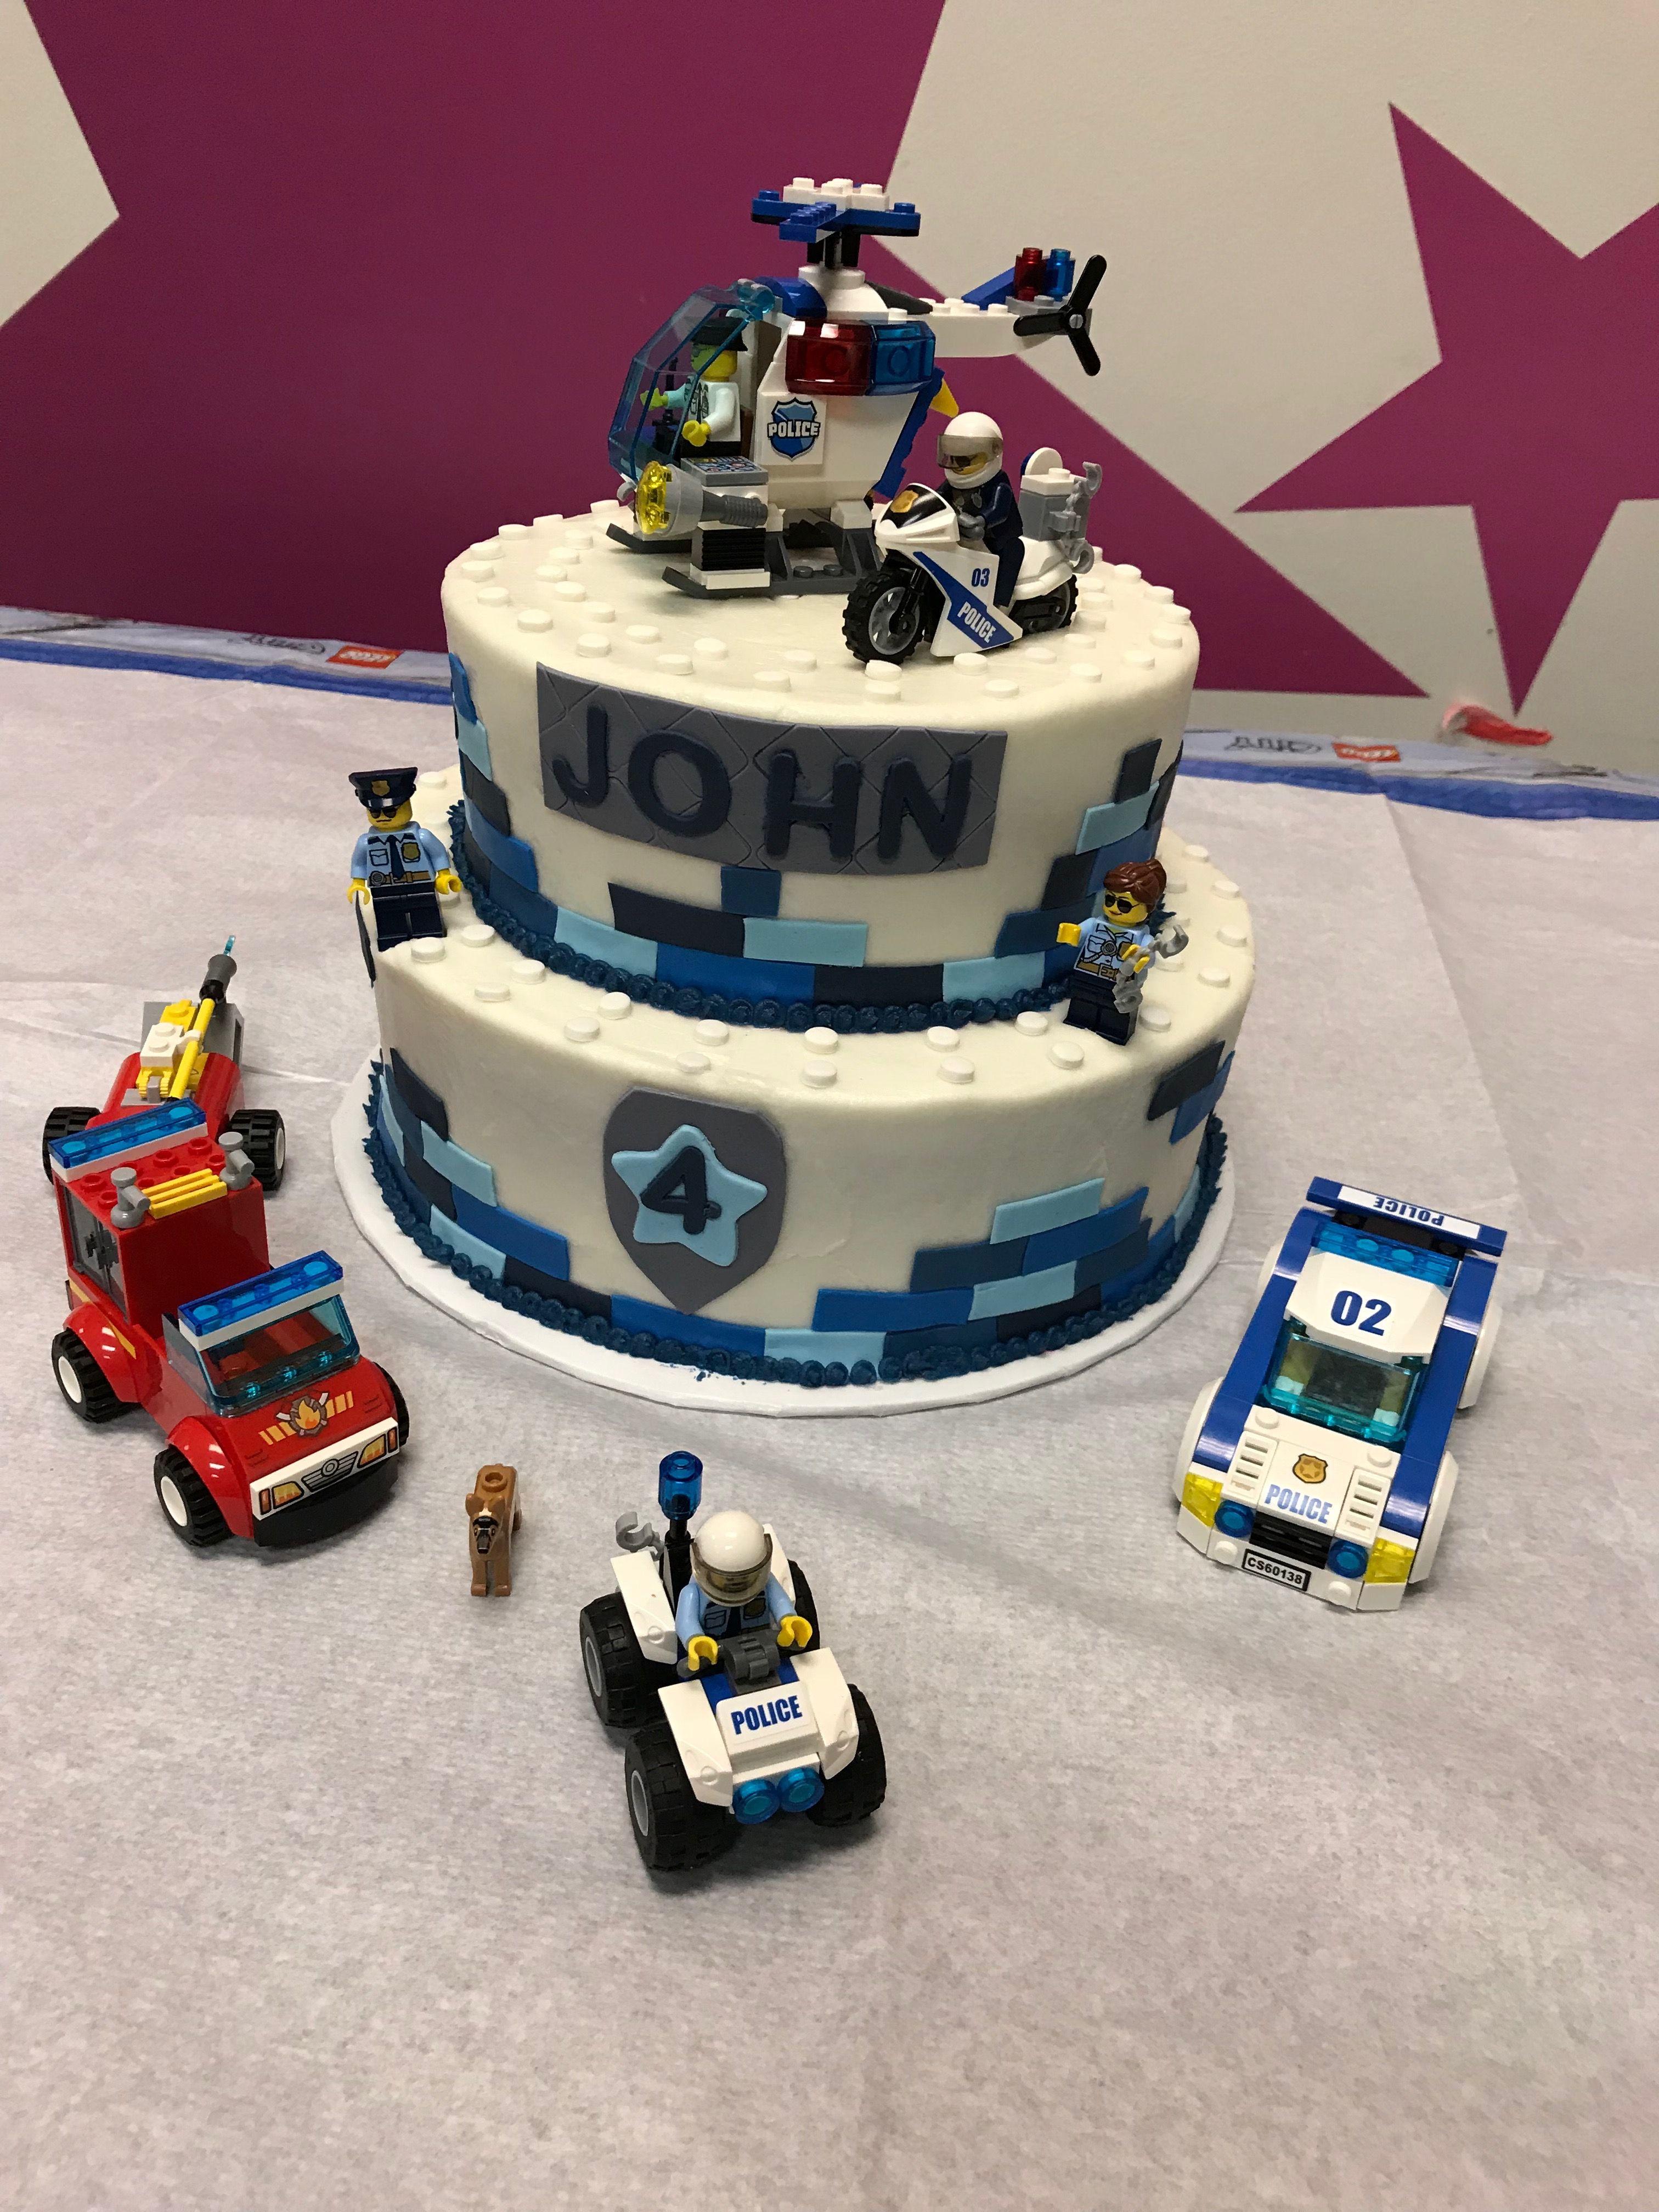 Police Lego Birthday Cake Https Www Facebook Com Sweetnsassycakesbyeva Police Birthday Cakes Police Birthday Lego Birthday Cake